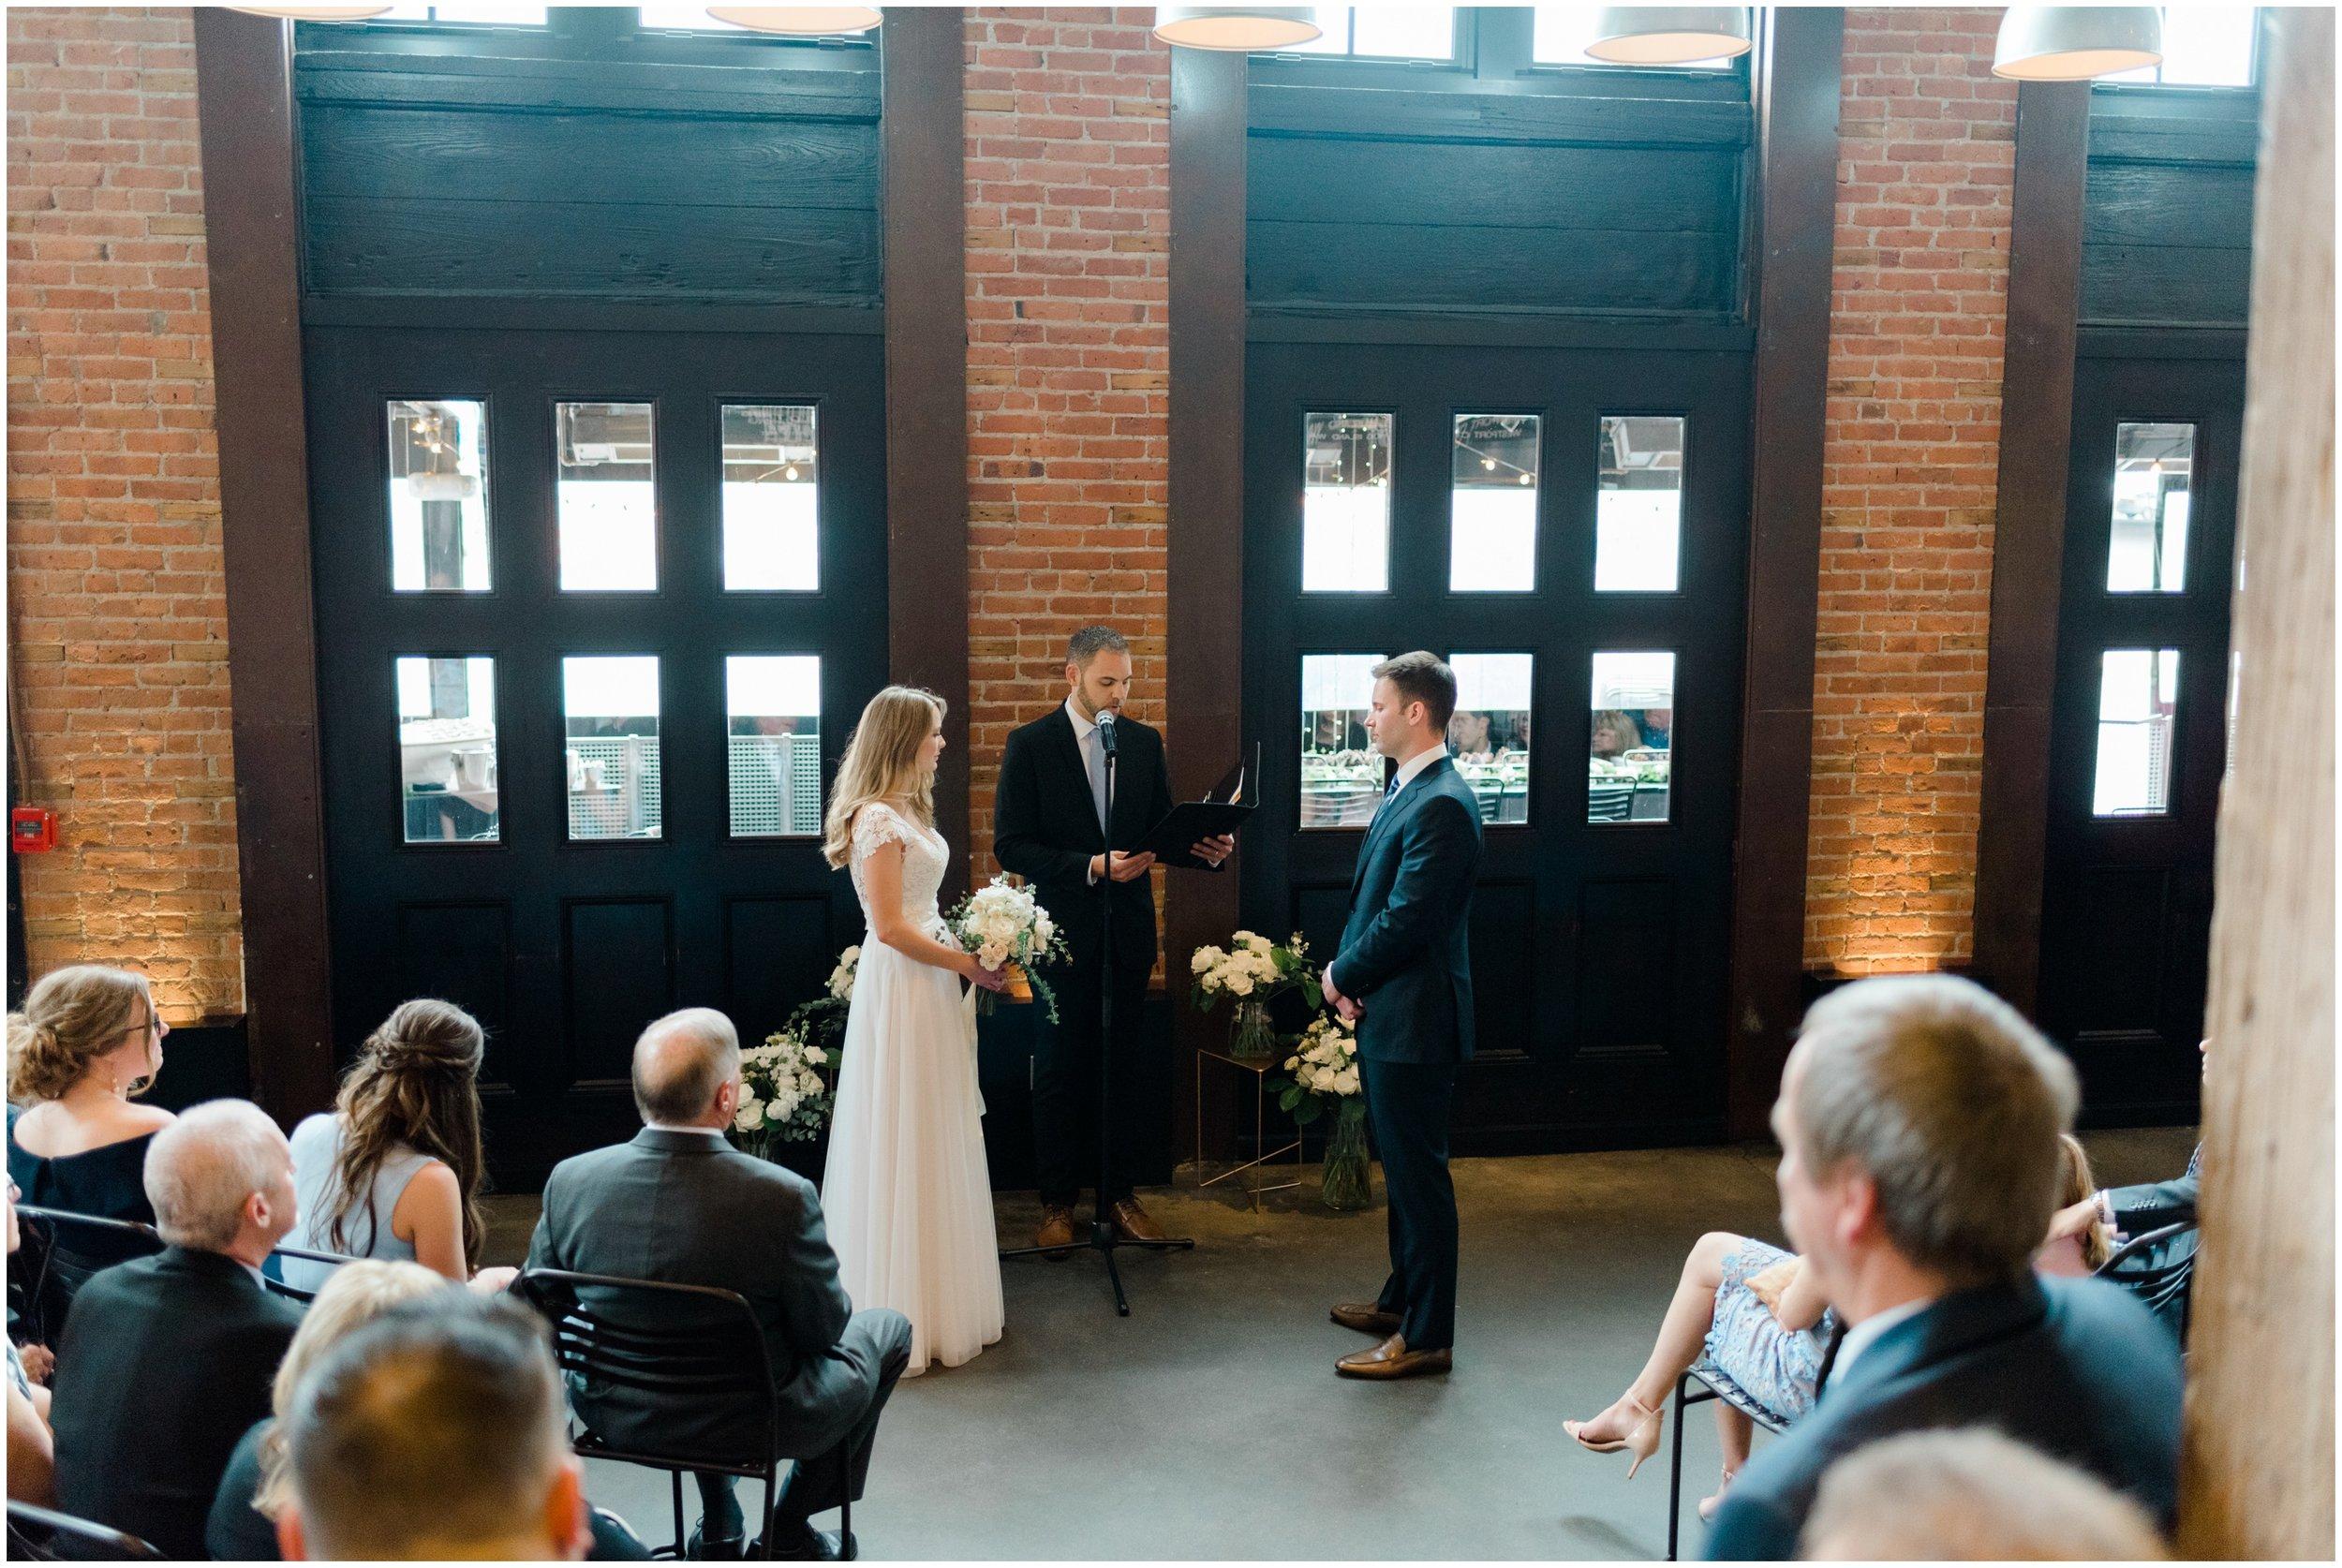 jay-robin-married-row-34-boston-31.jpg